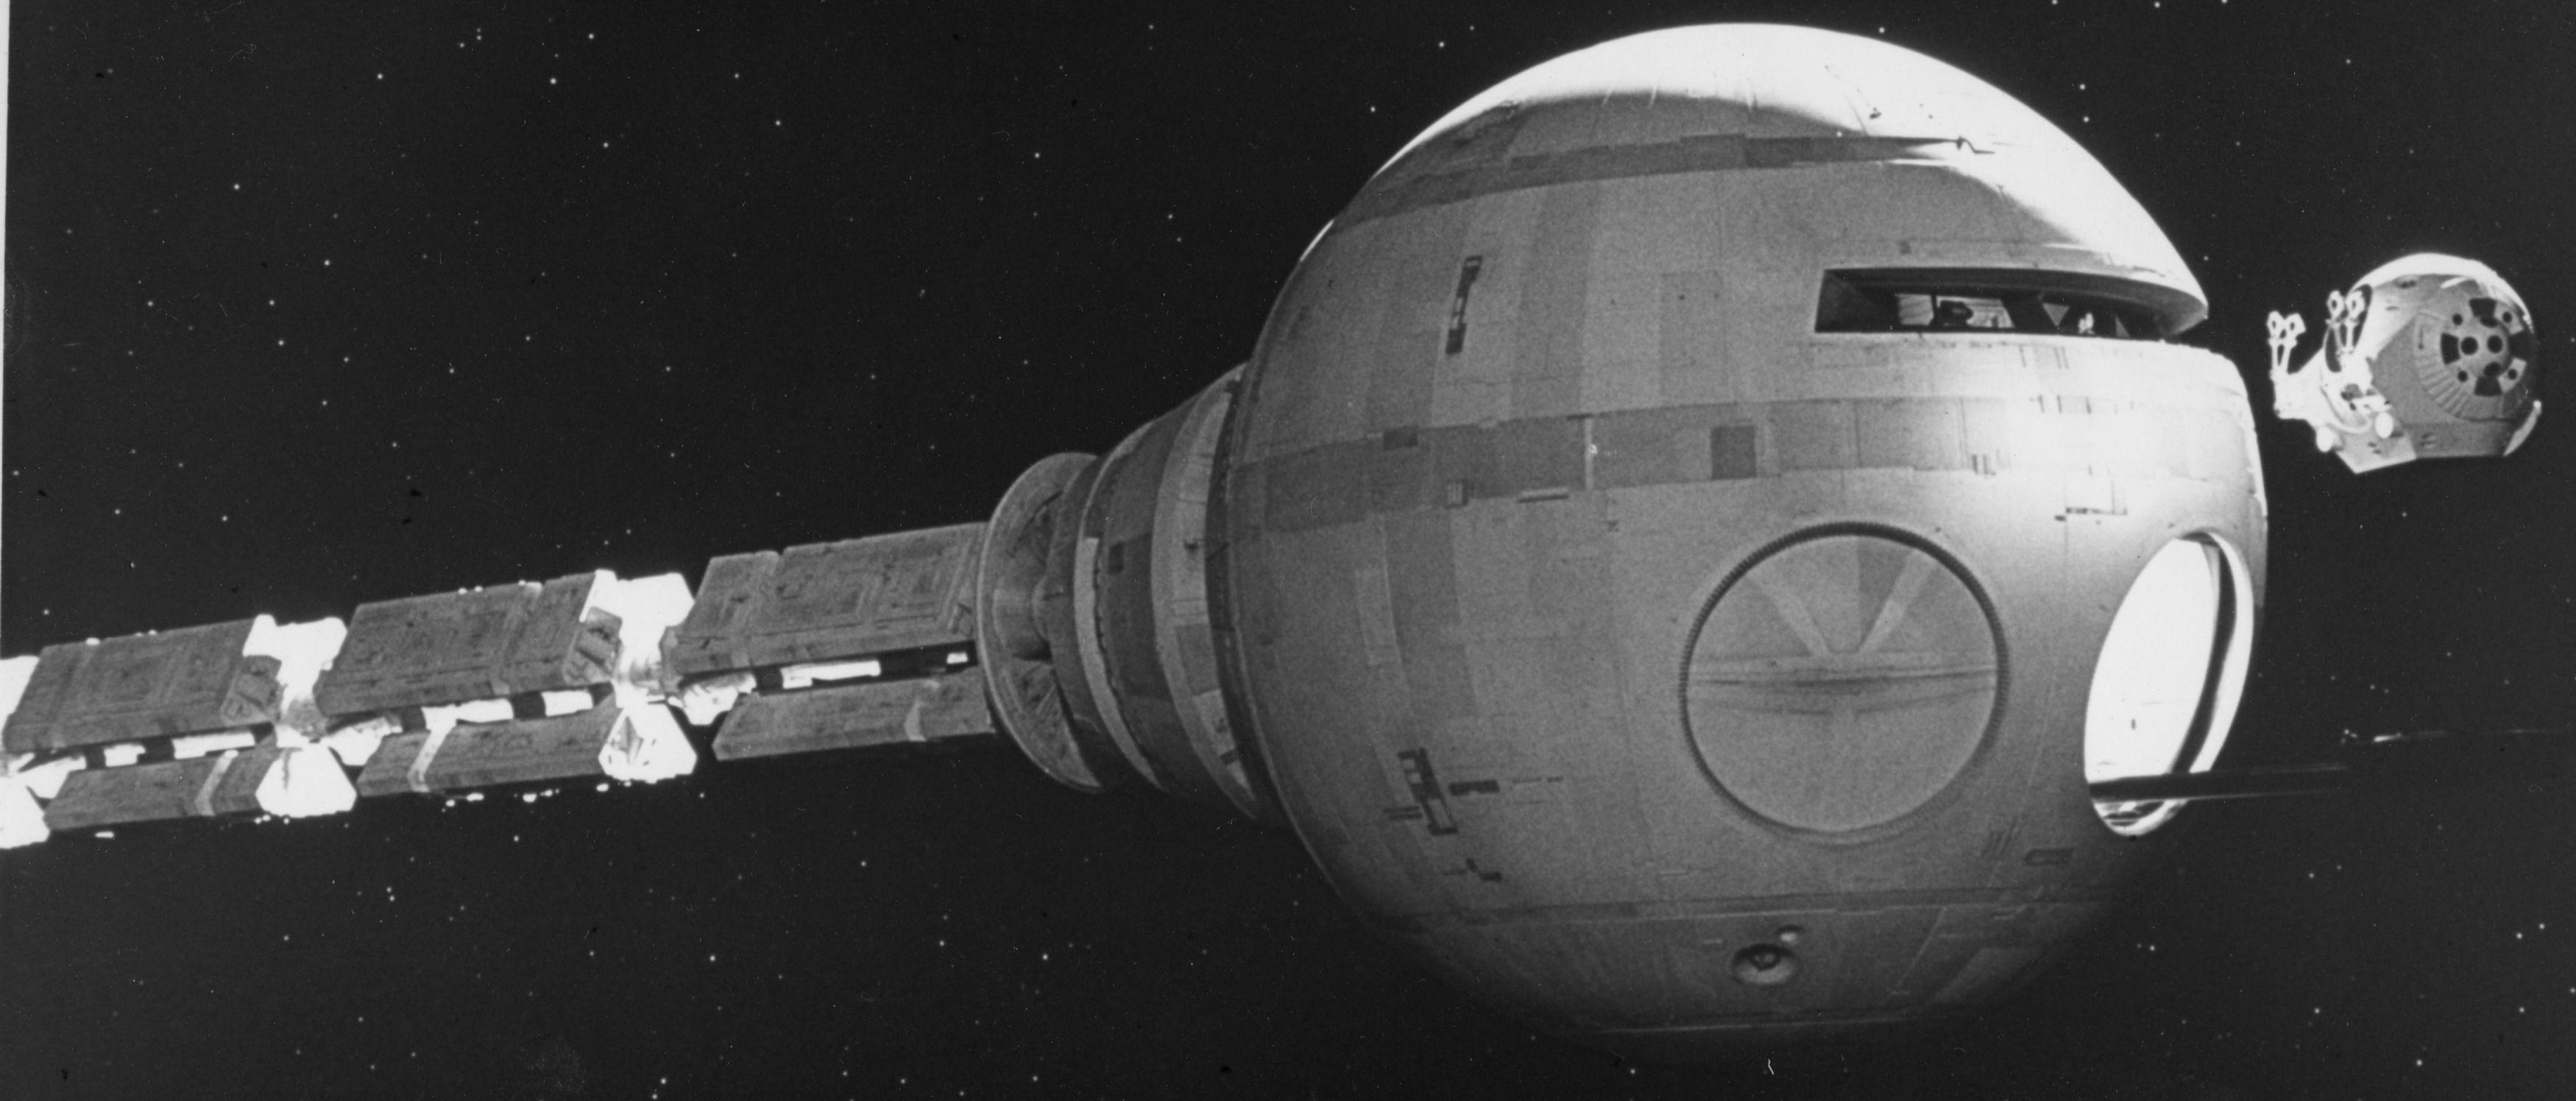 2001 A Space Odyssey Photos